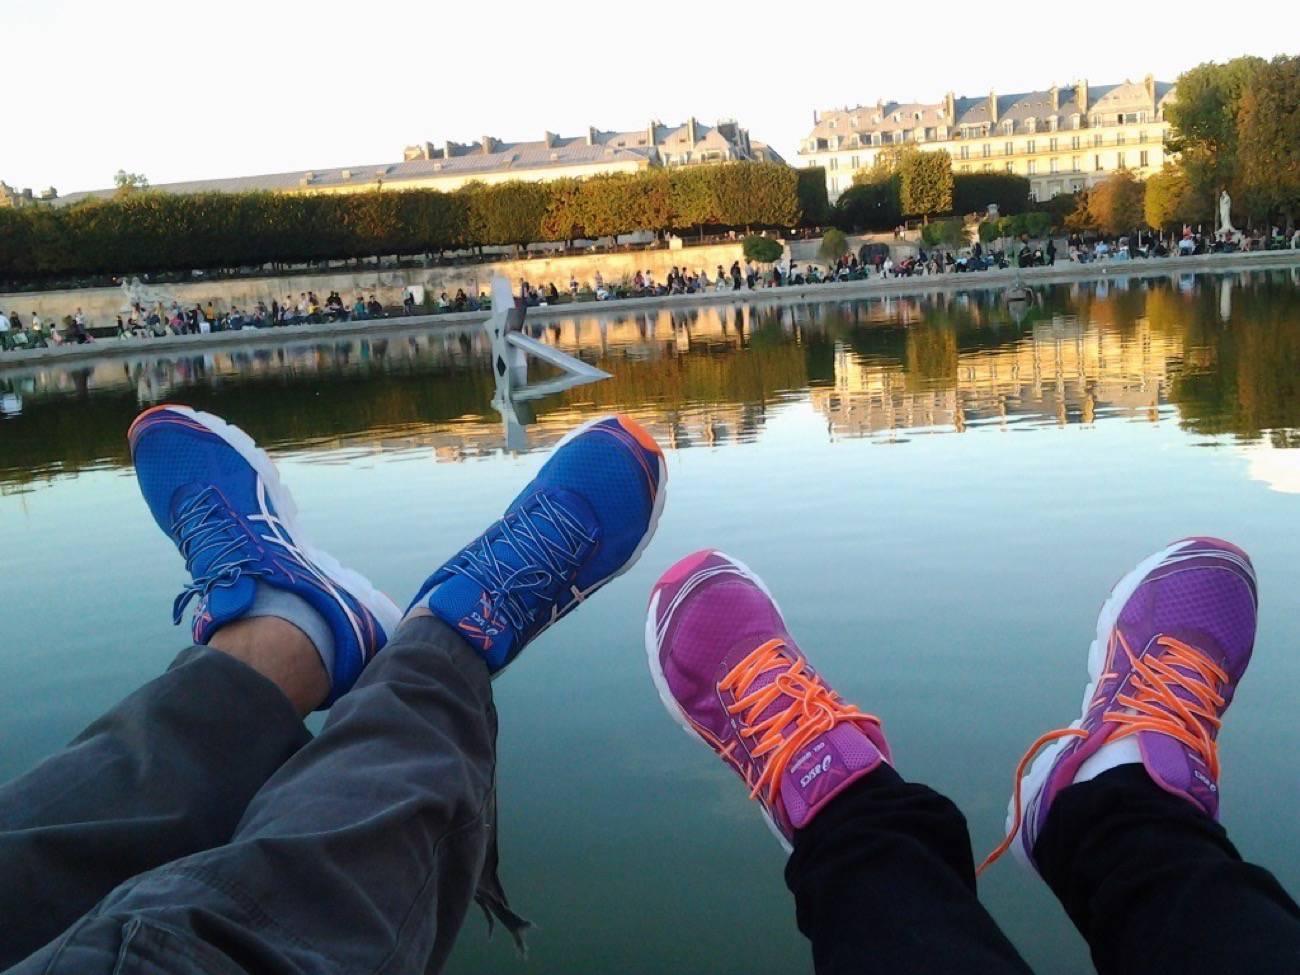 viajero o turista con zapatillas